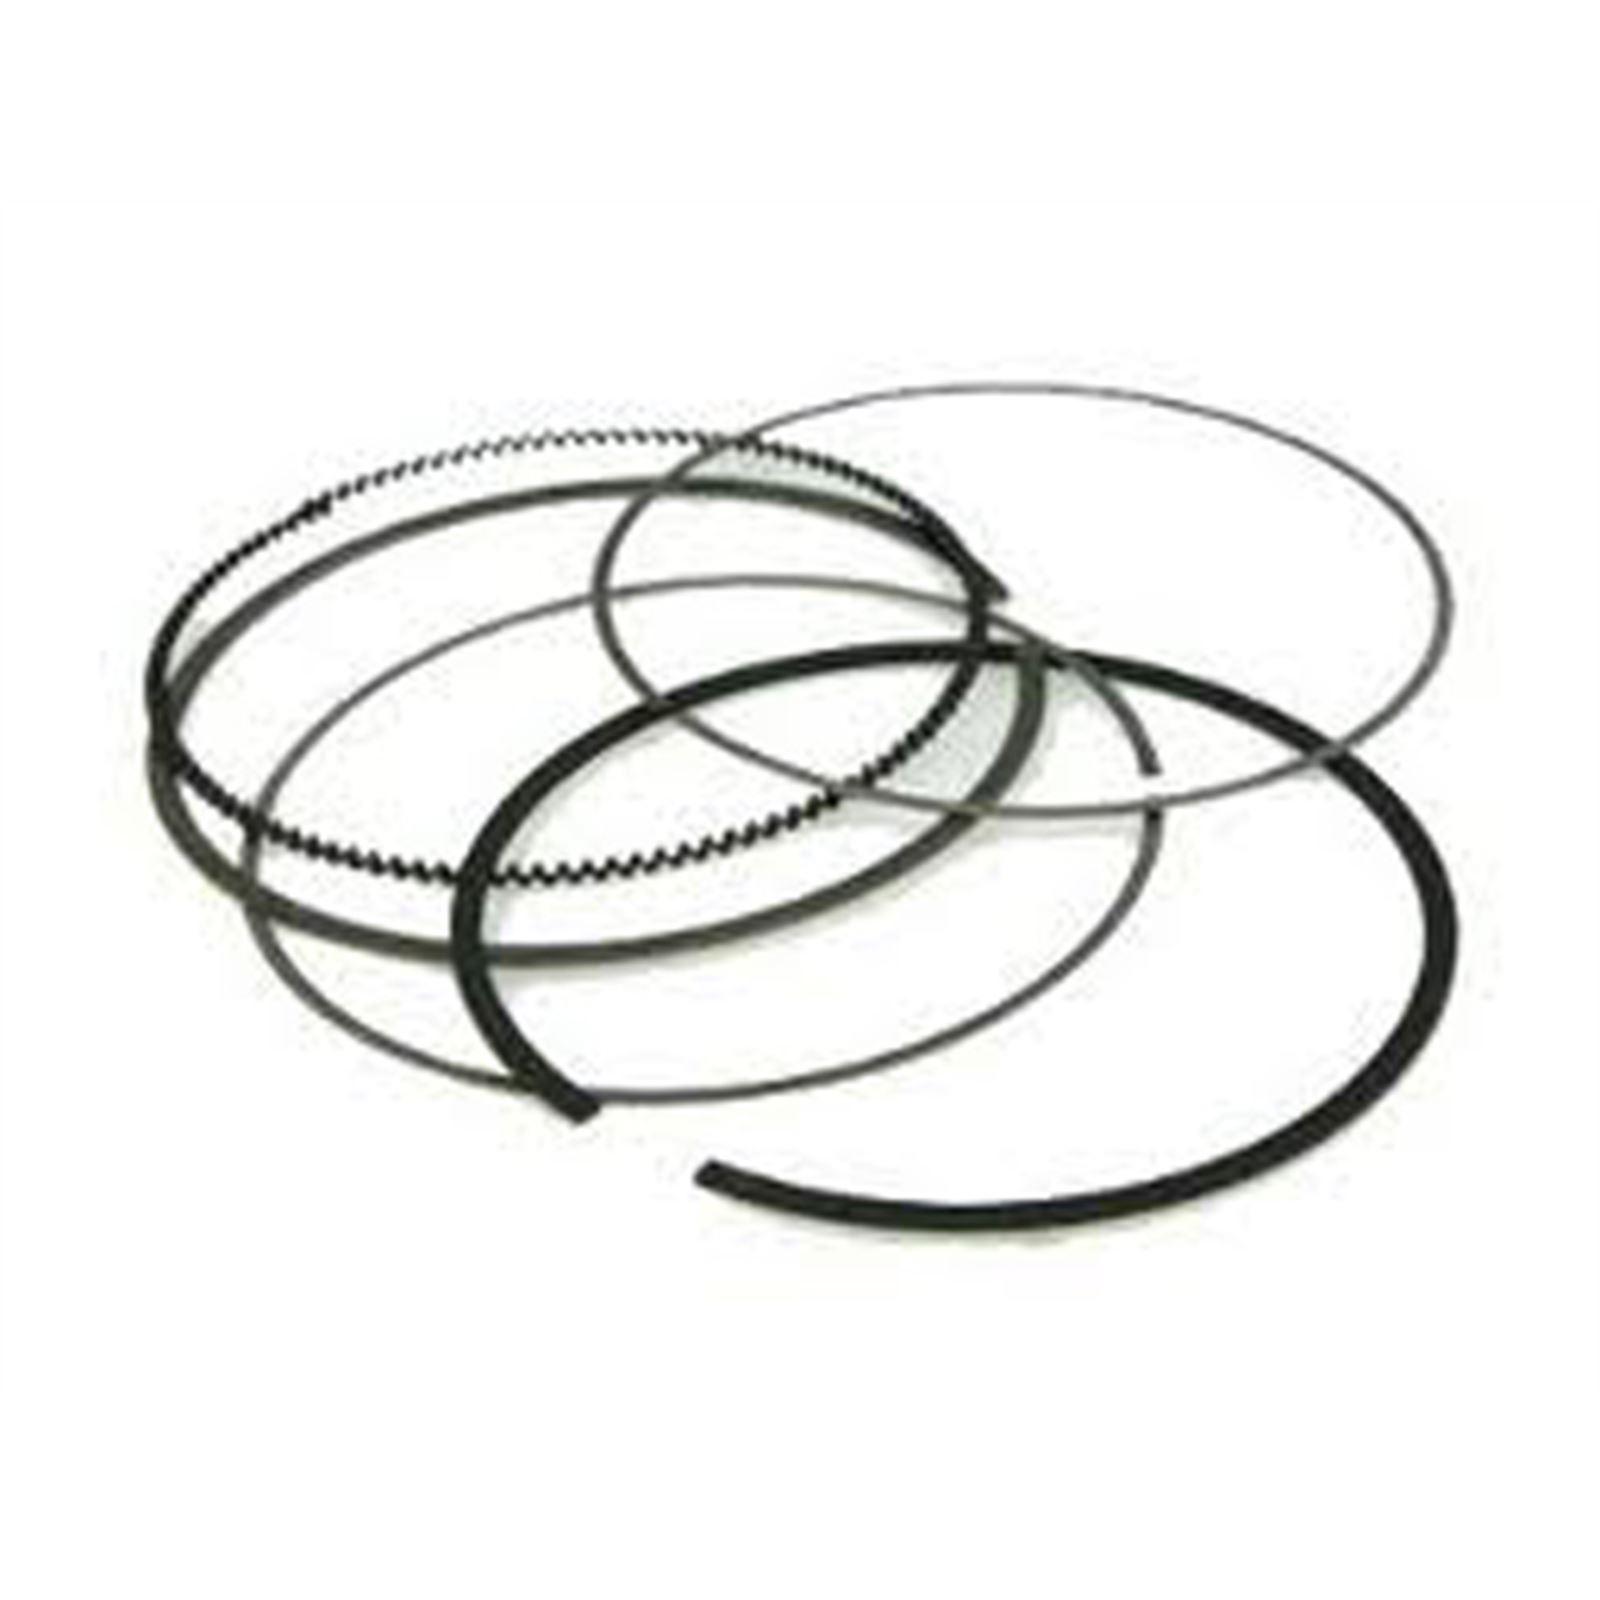 Namura Ring Kit